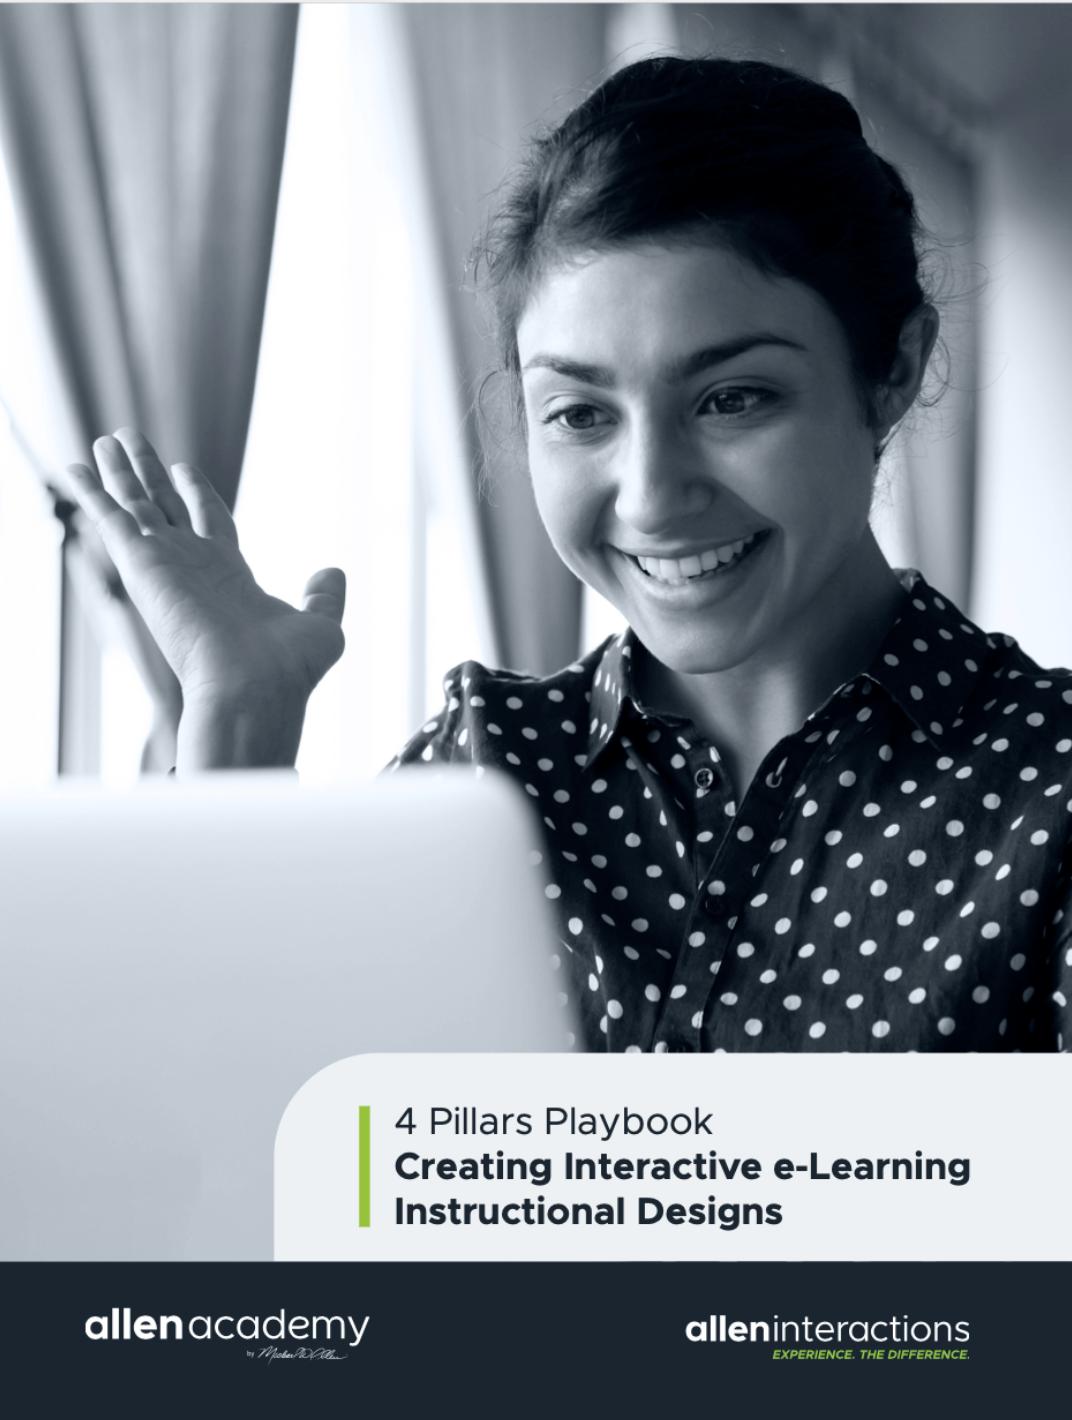 4 Pillars Playbook: Creating Interactive eLearning Instructional Designs